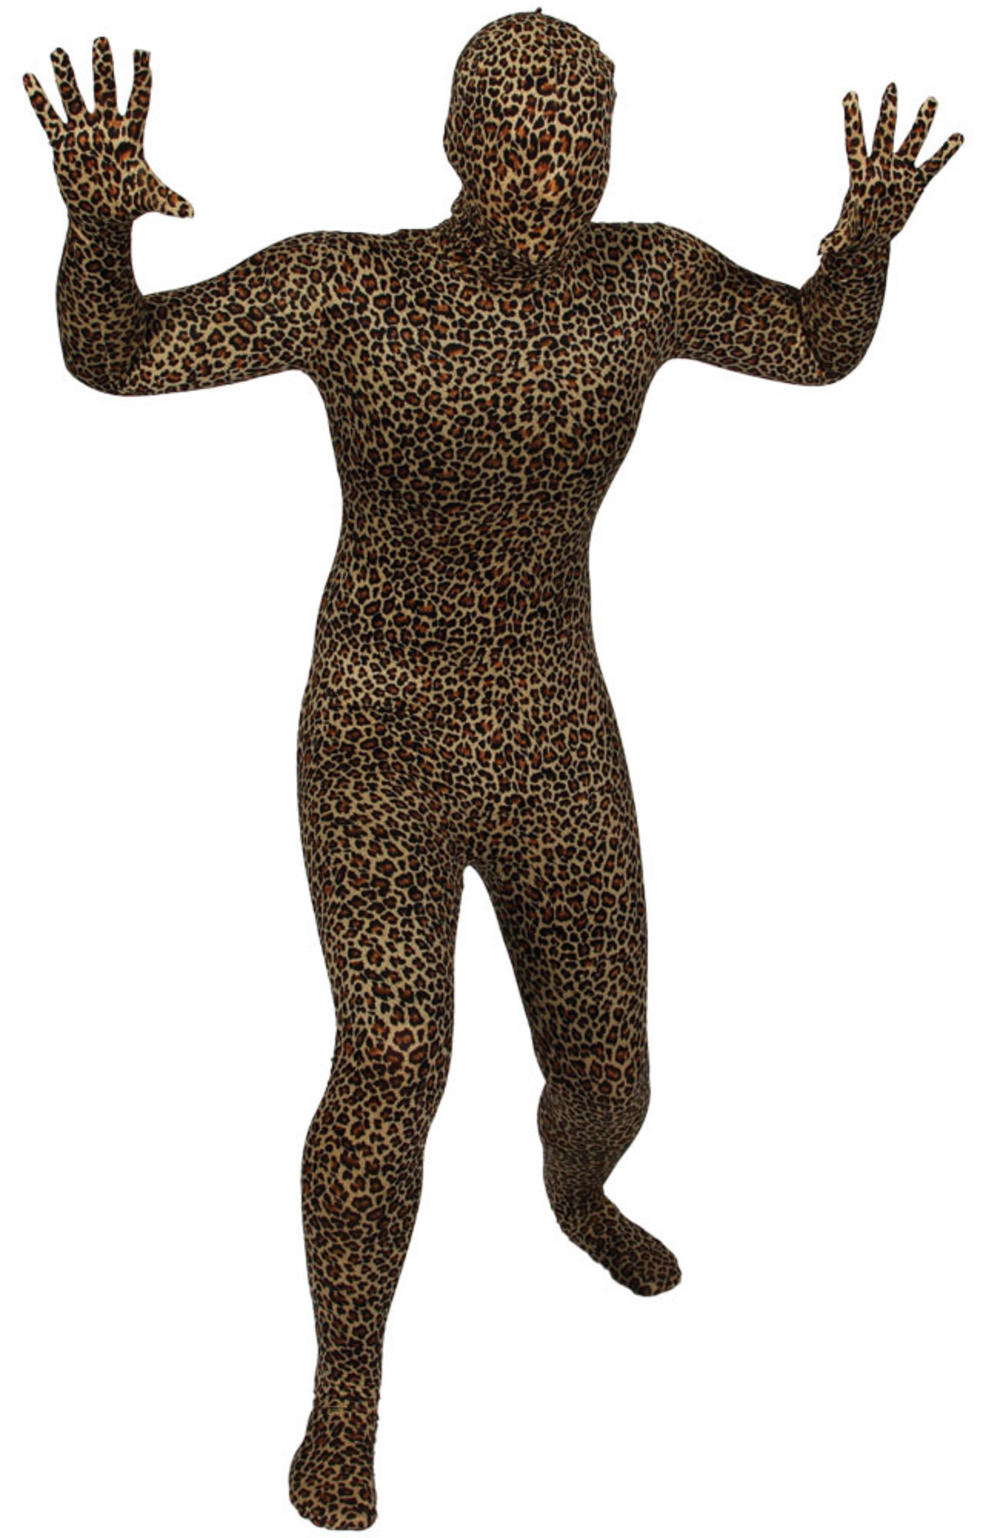 Skinz Leopard Skin